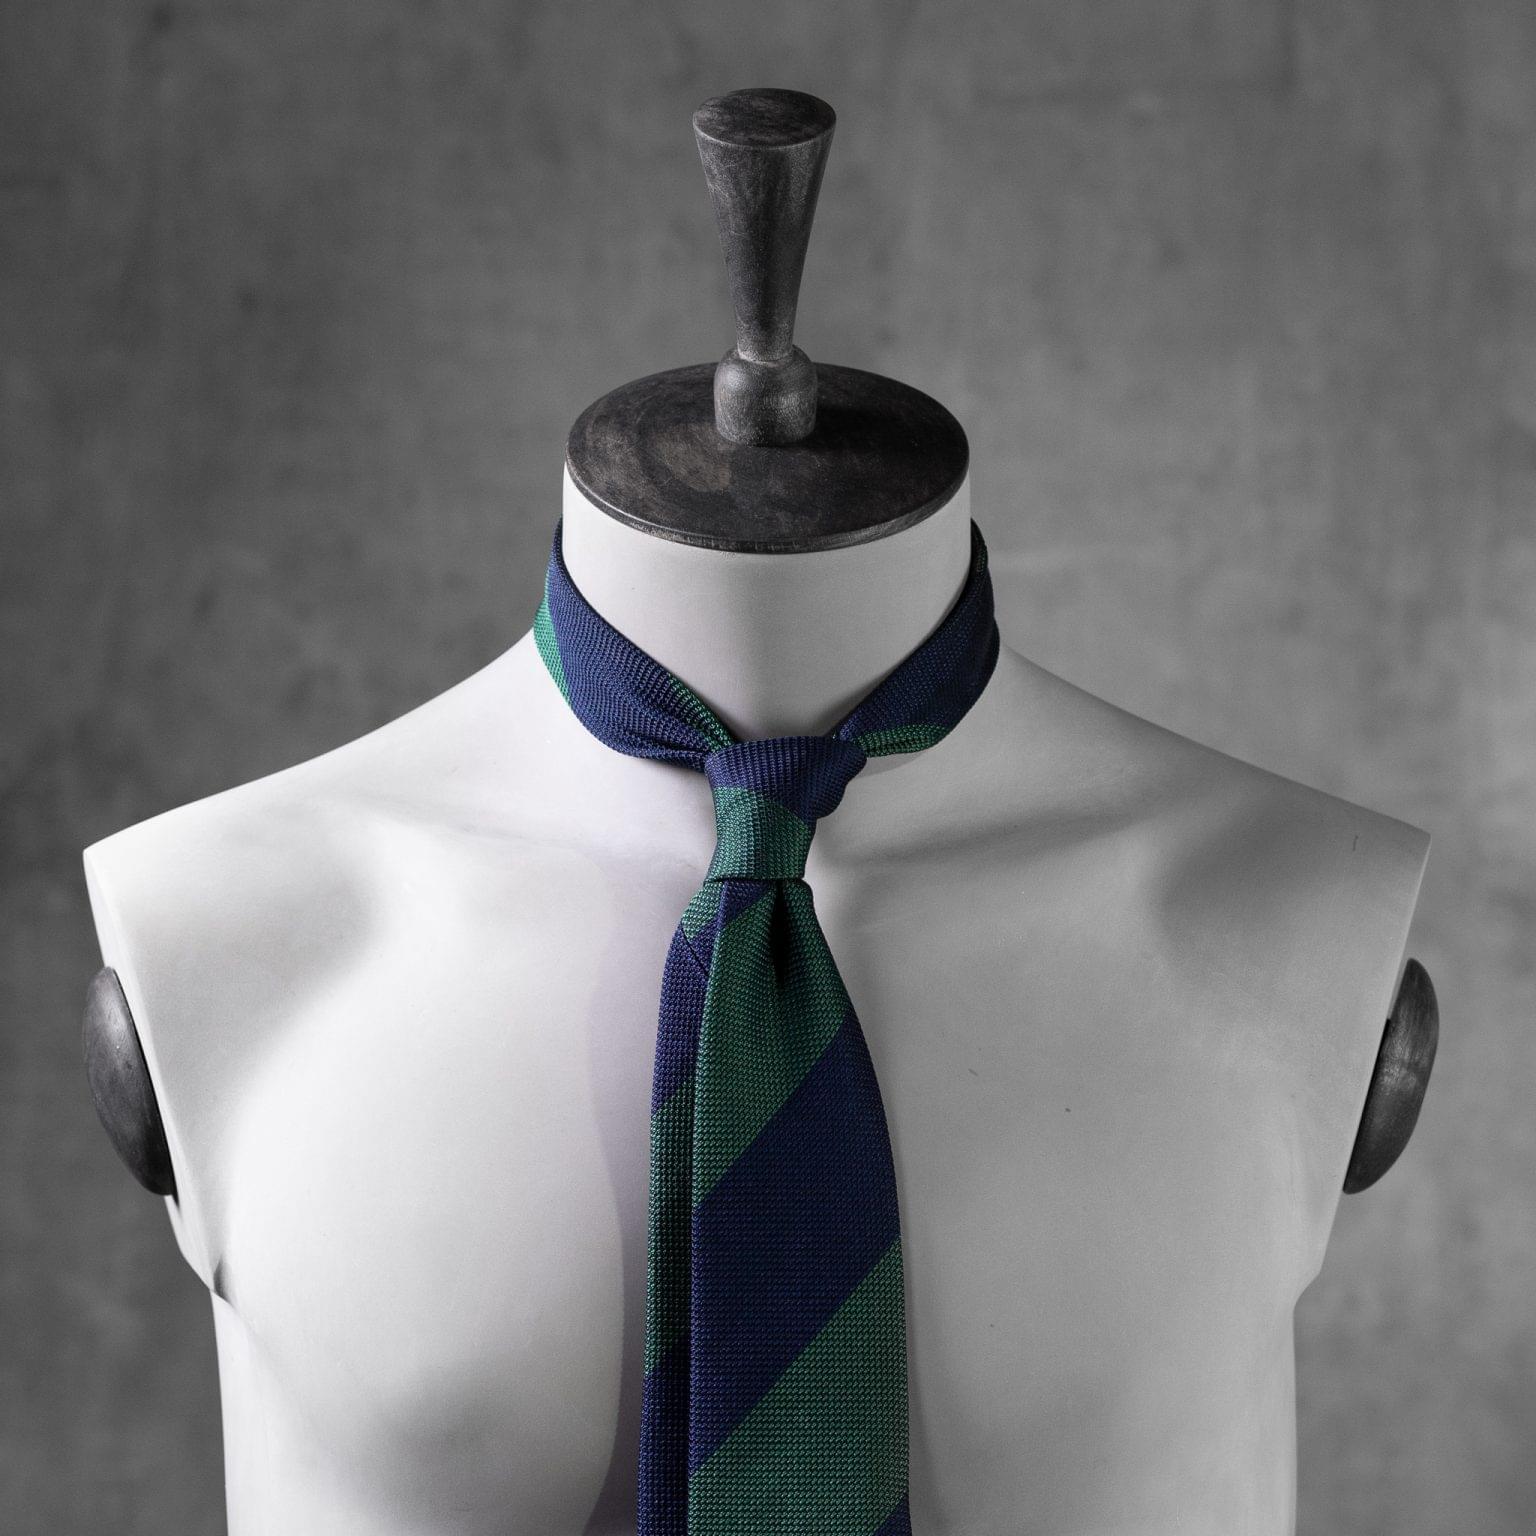 GRENADINE-0523-Tie-Initials-Corbata-Iniciales-The-Seelk-3